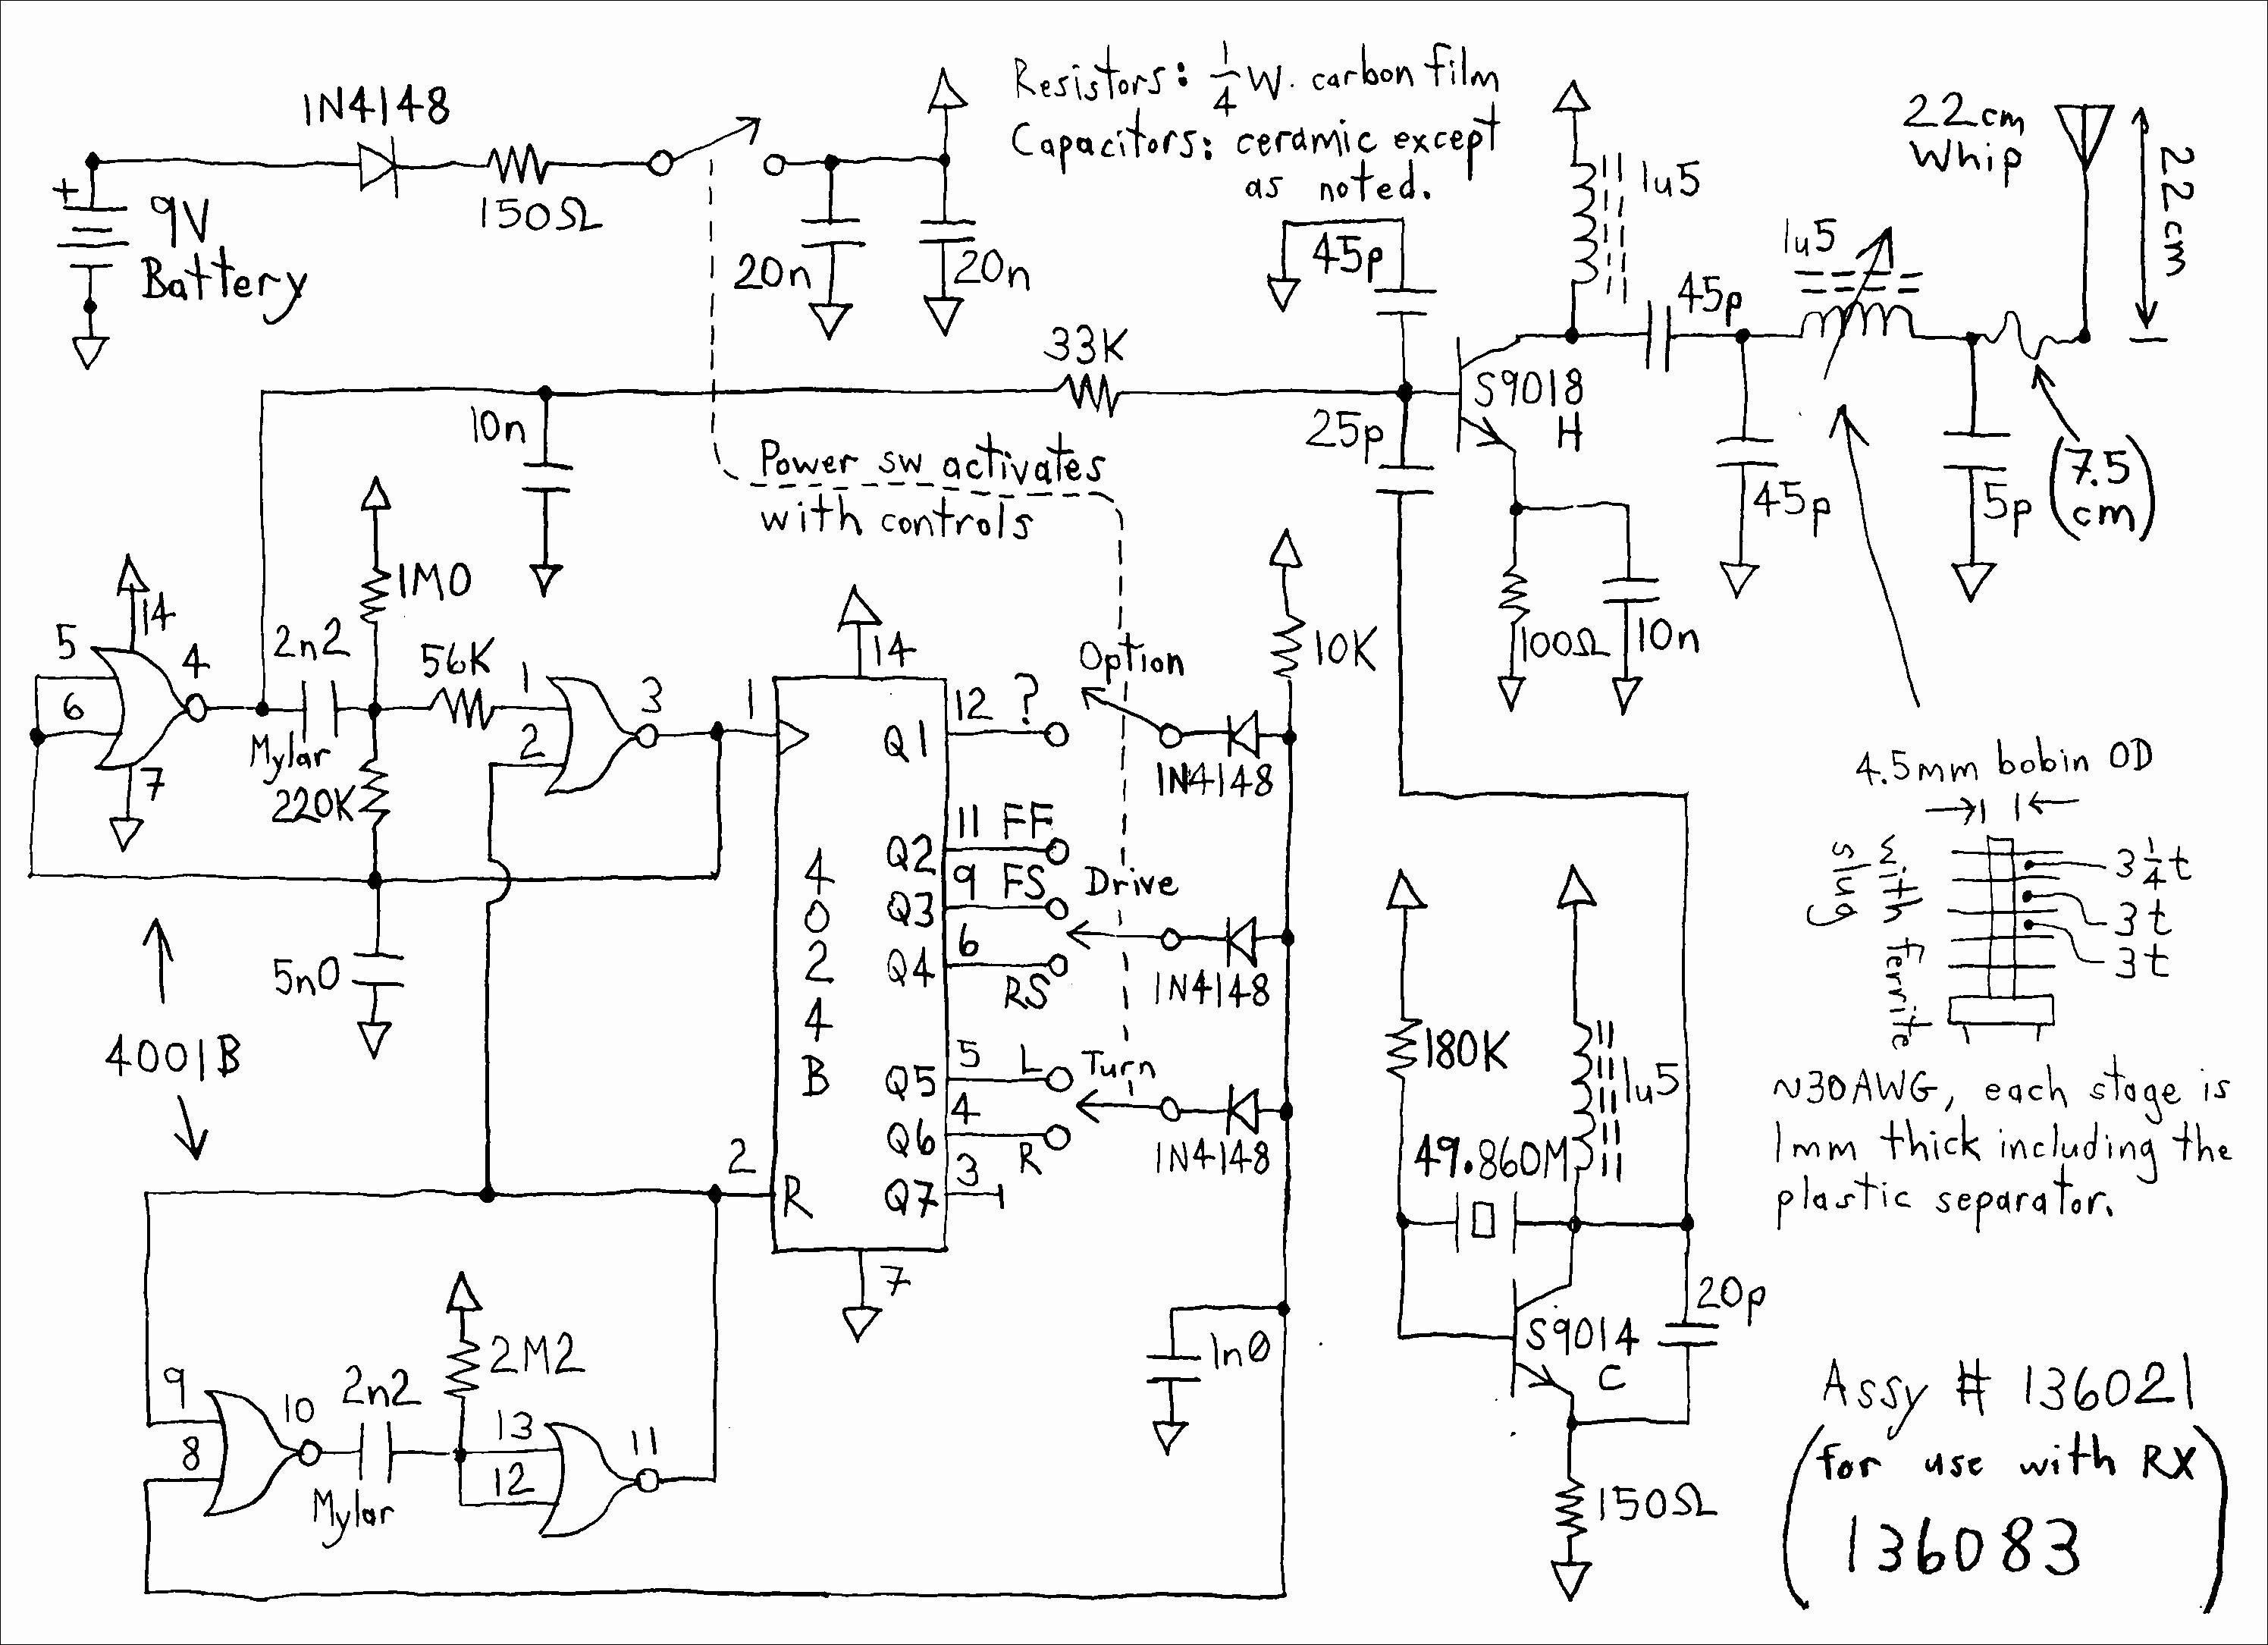 Remote Control Car Circuit Diagram Pdf solar Vehicle Wiring Diagram Detailed Schematic Diagrams